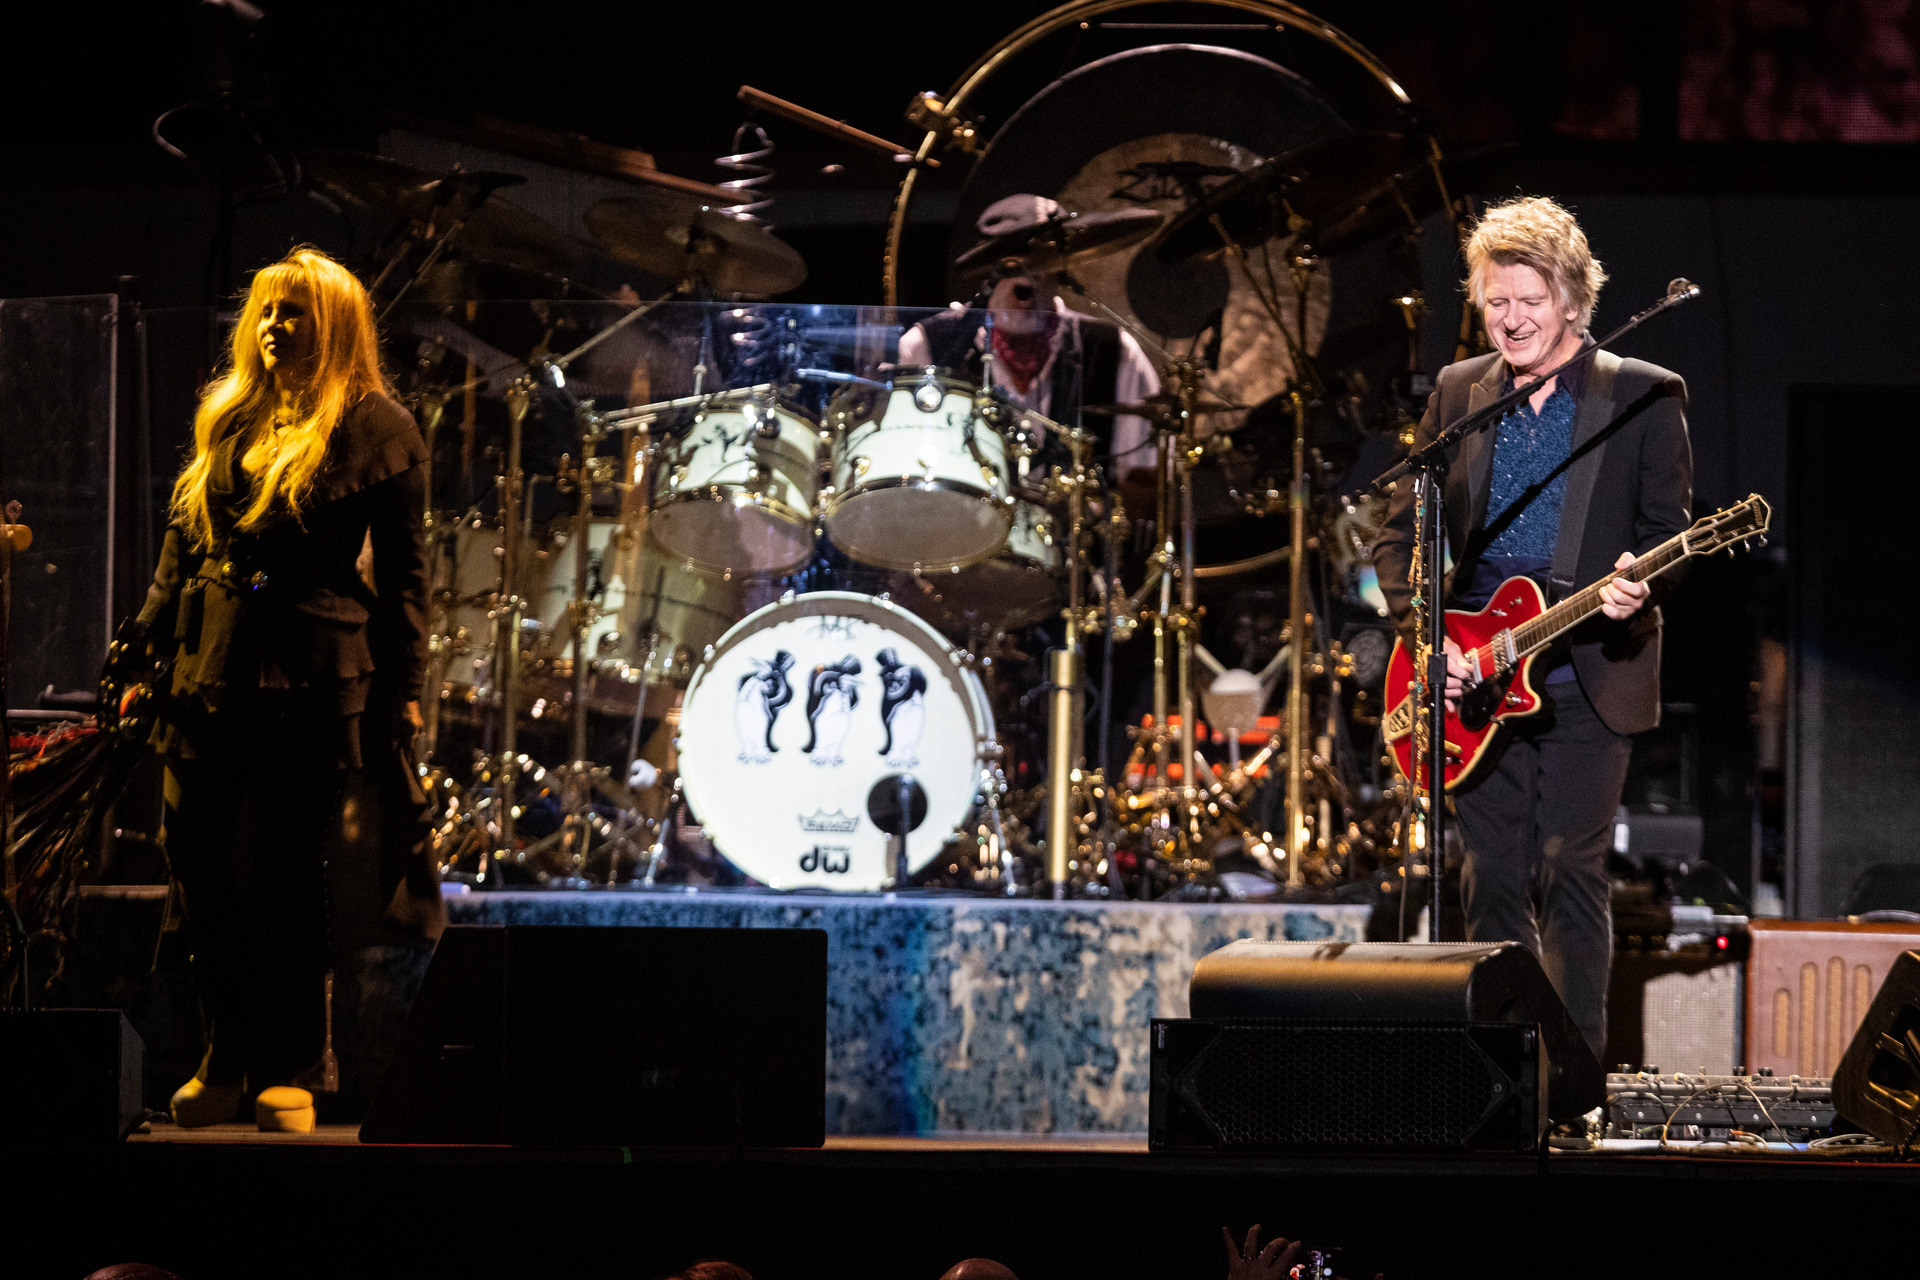 Gig review: Fleetwood Mac at Spark Arena